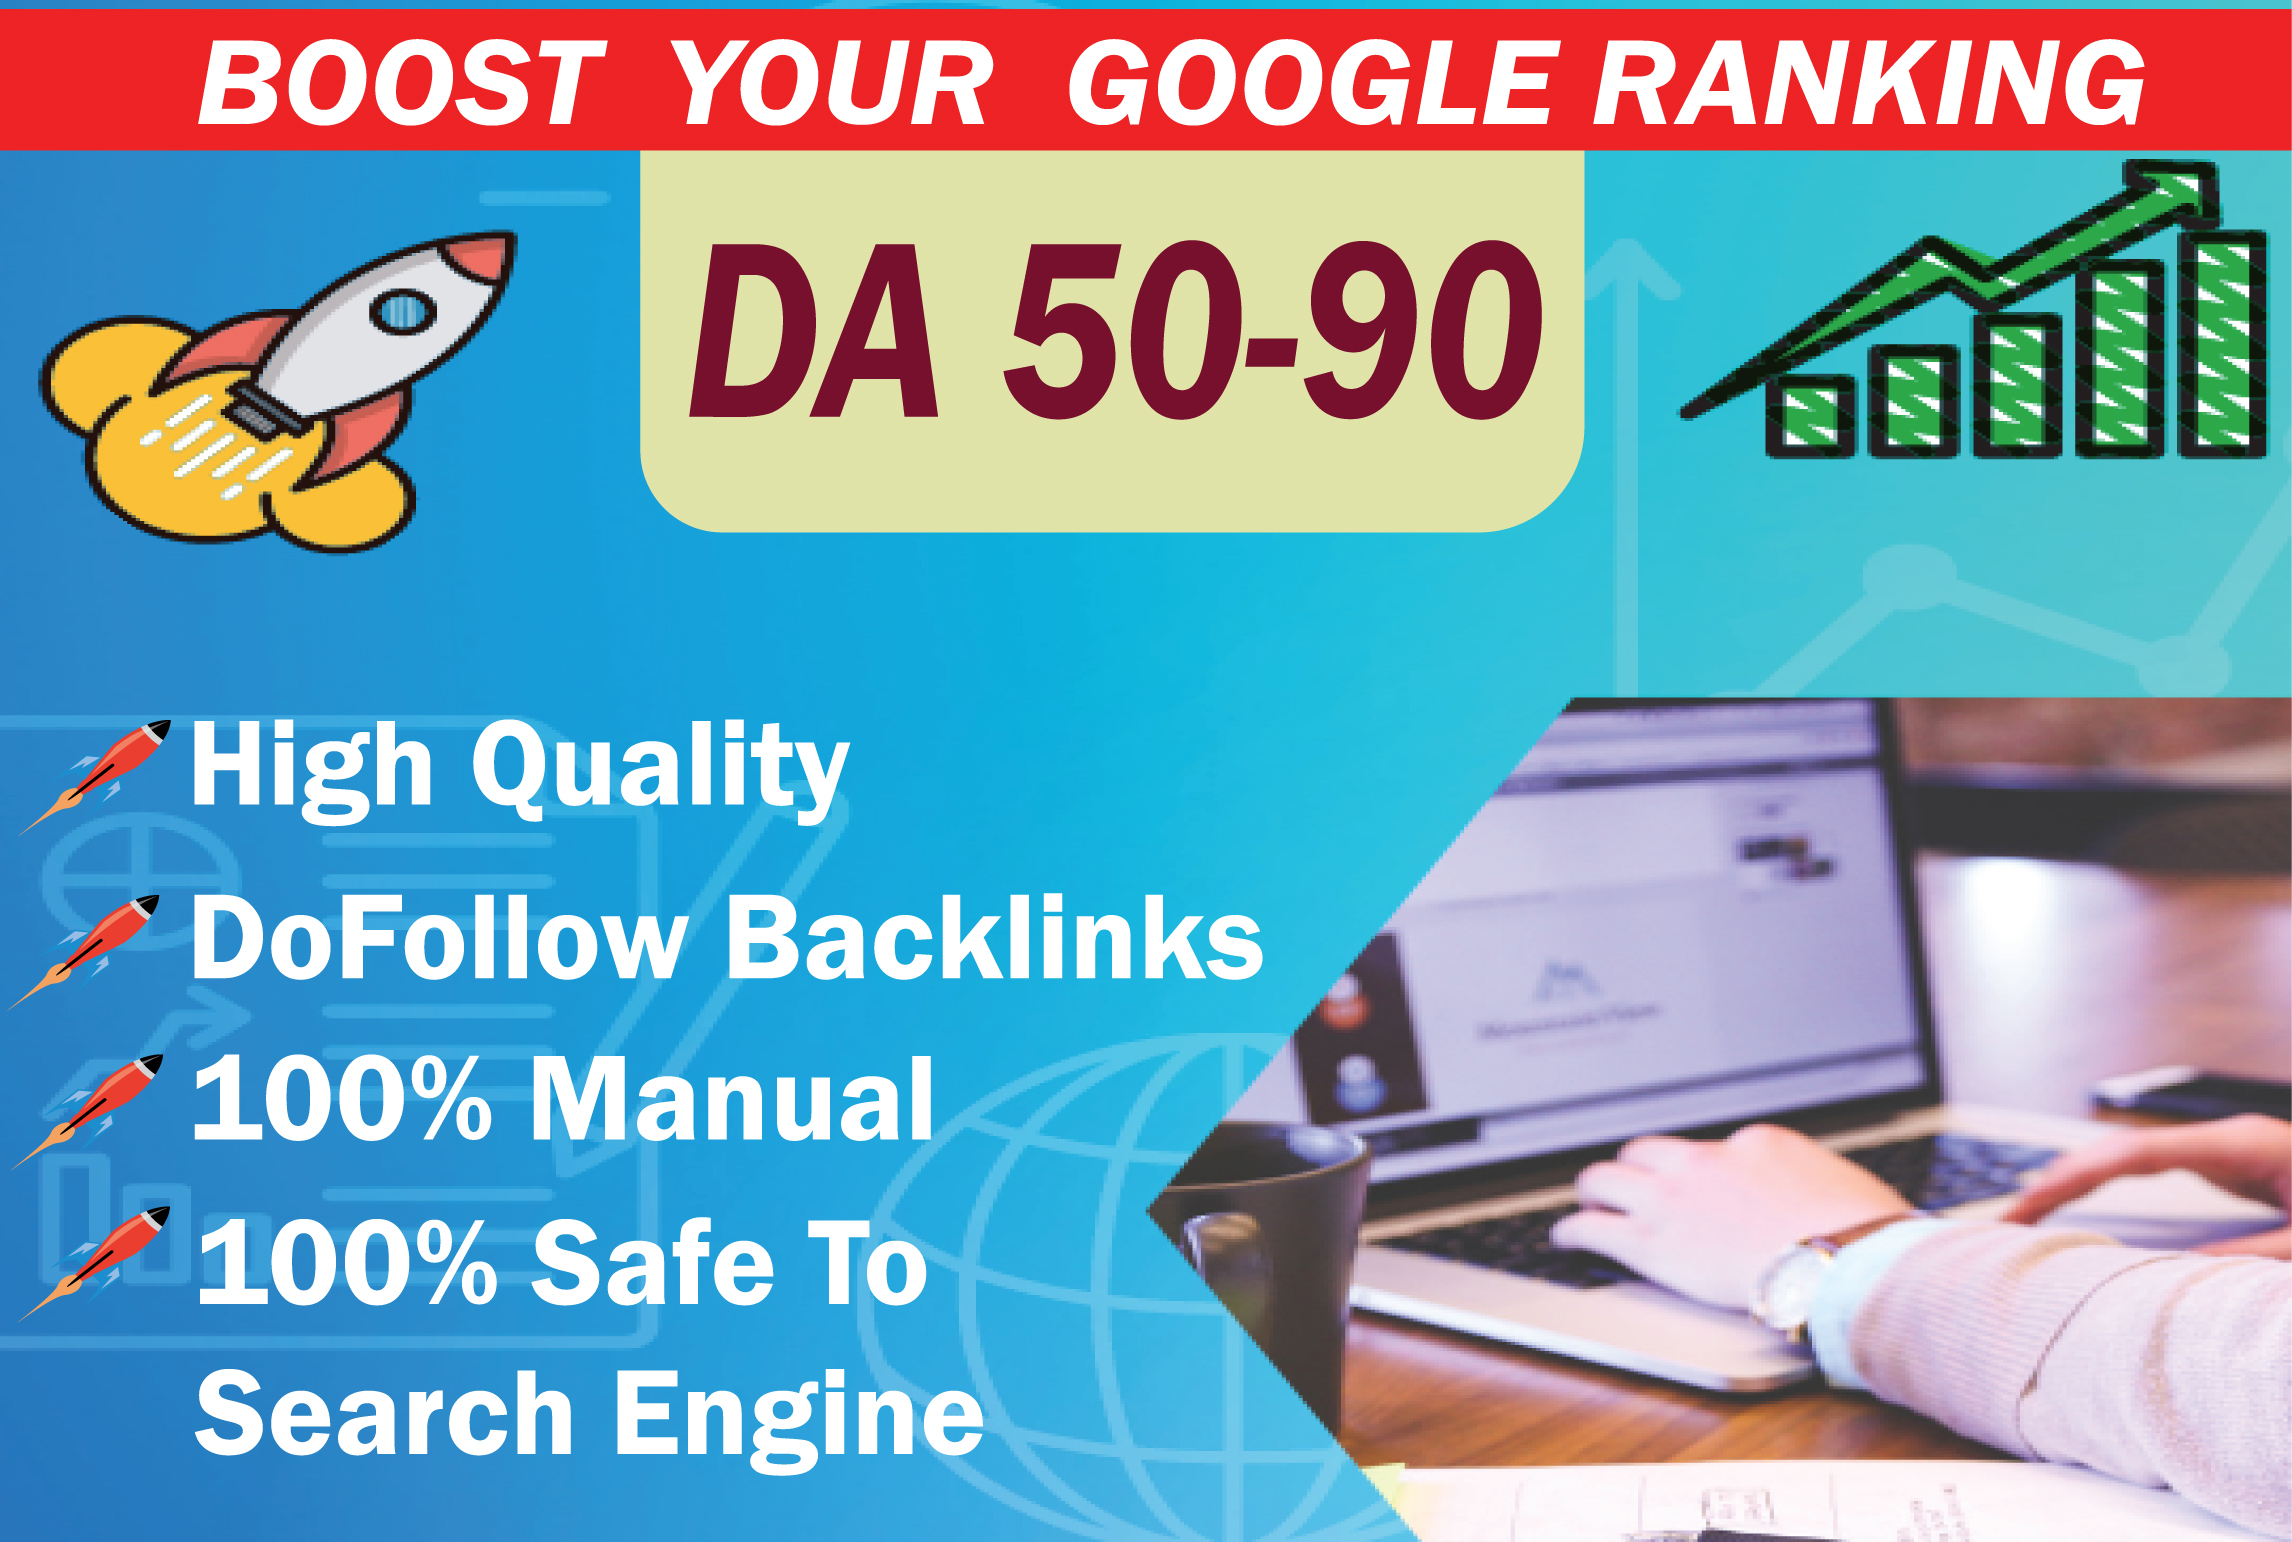 I will build high quality SEO backlinks high da authority to improve ranking